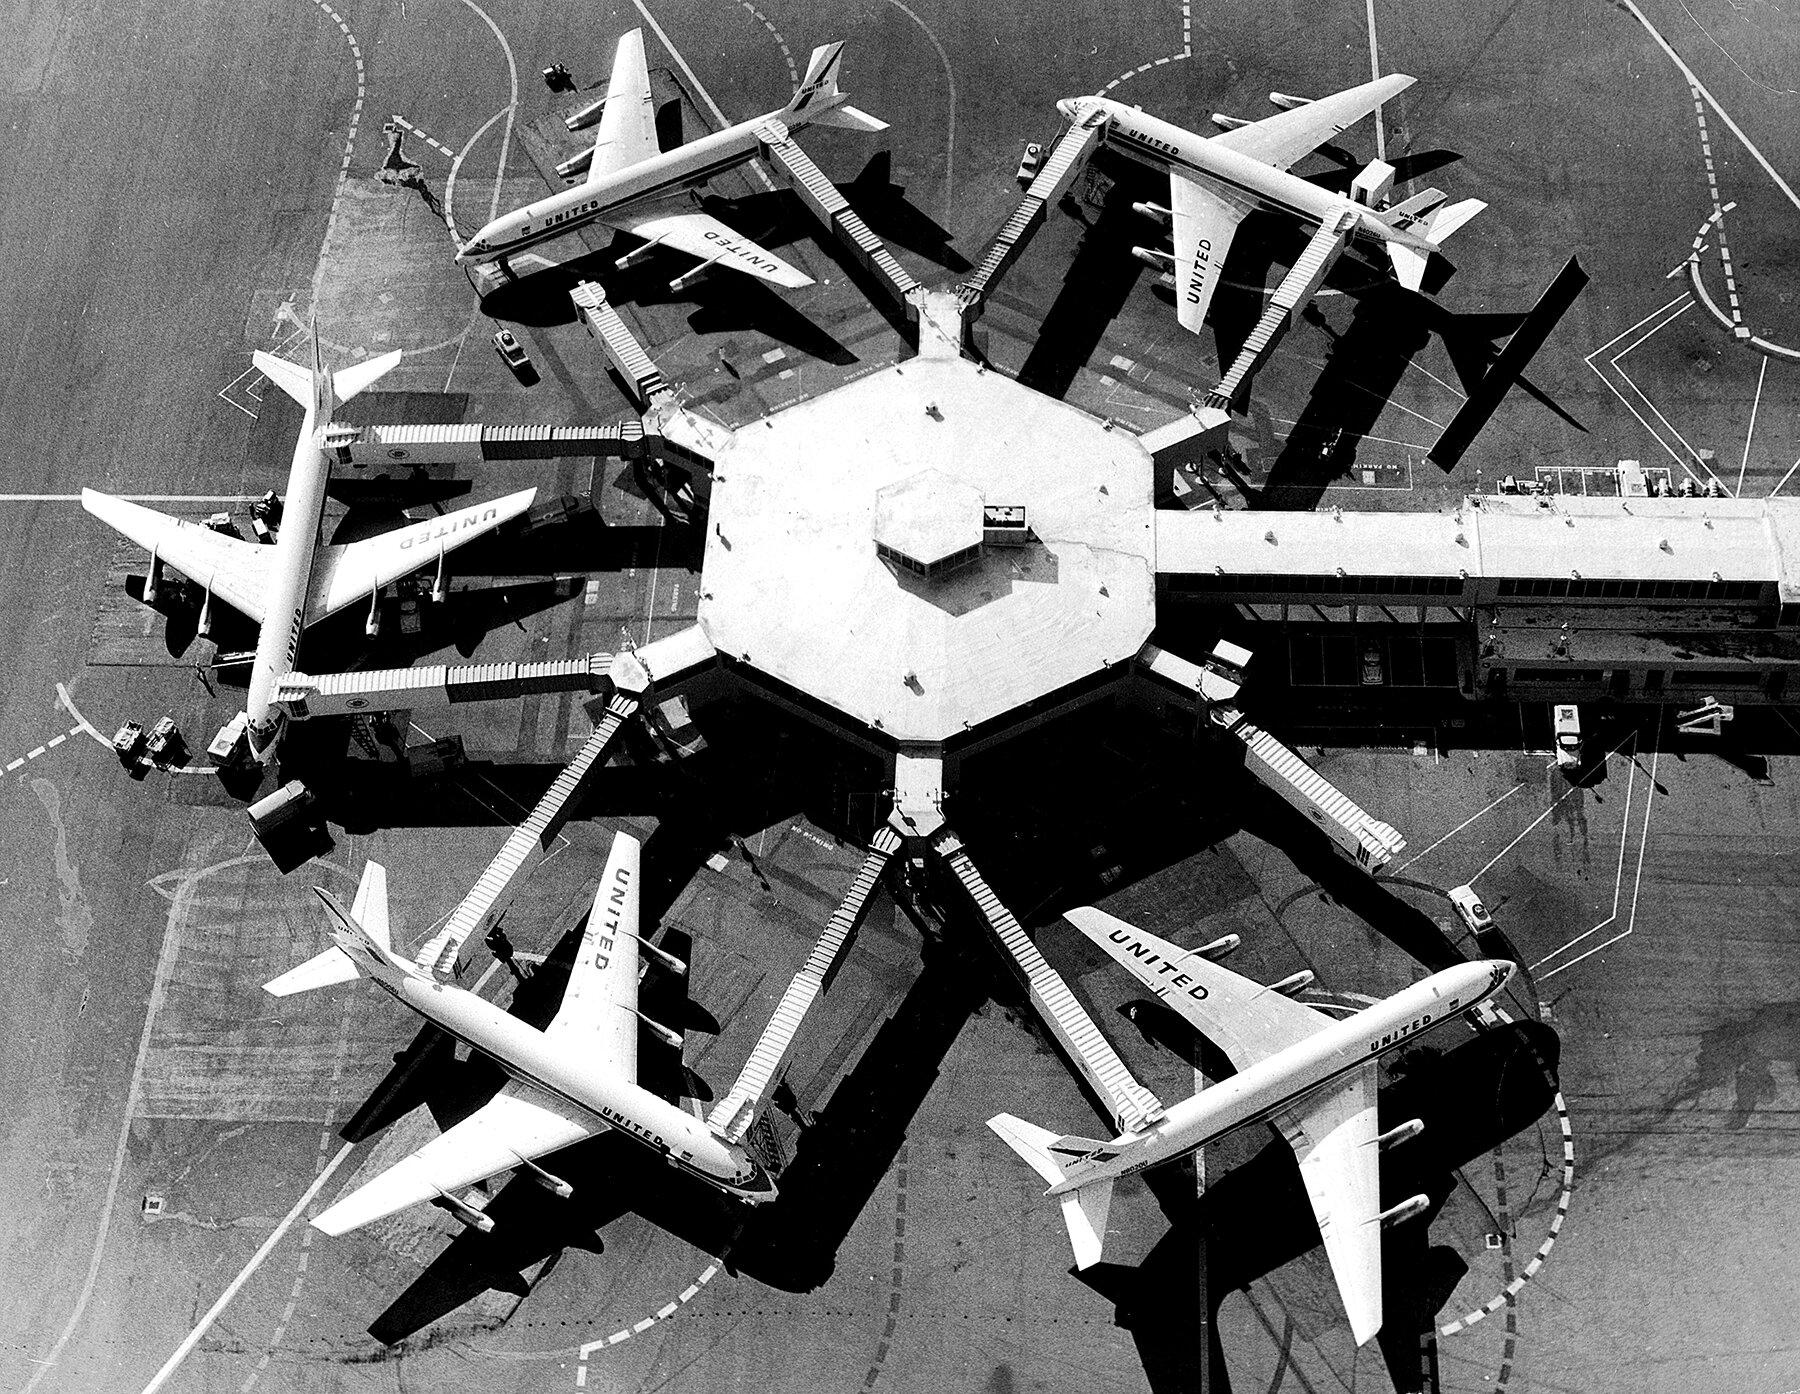 United Air Lines DC-8 jets parked at tandem aero-gangplank loading bridges, San Francisco International Airport, circa 1962.